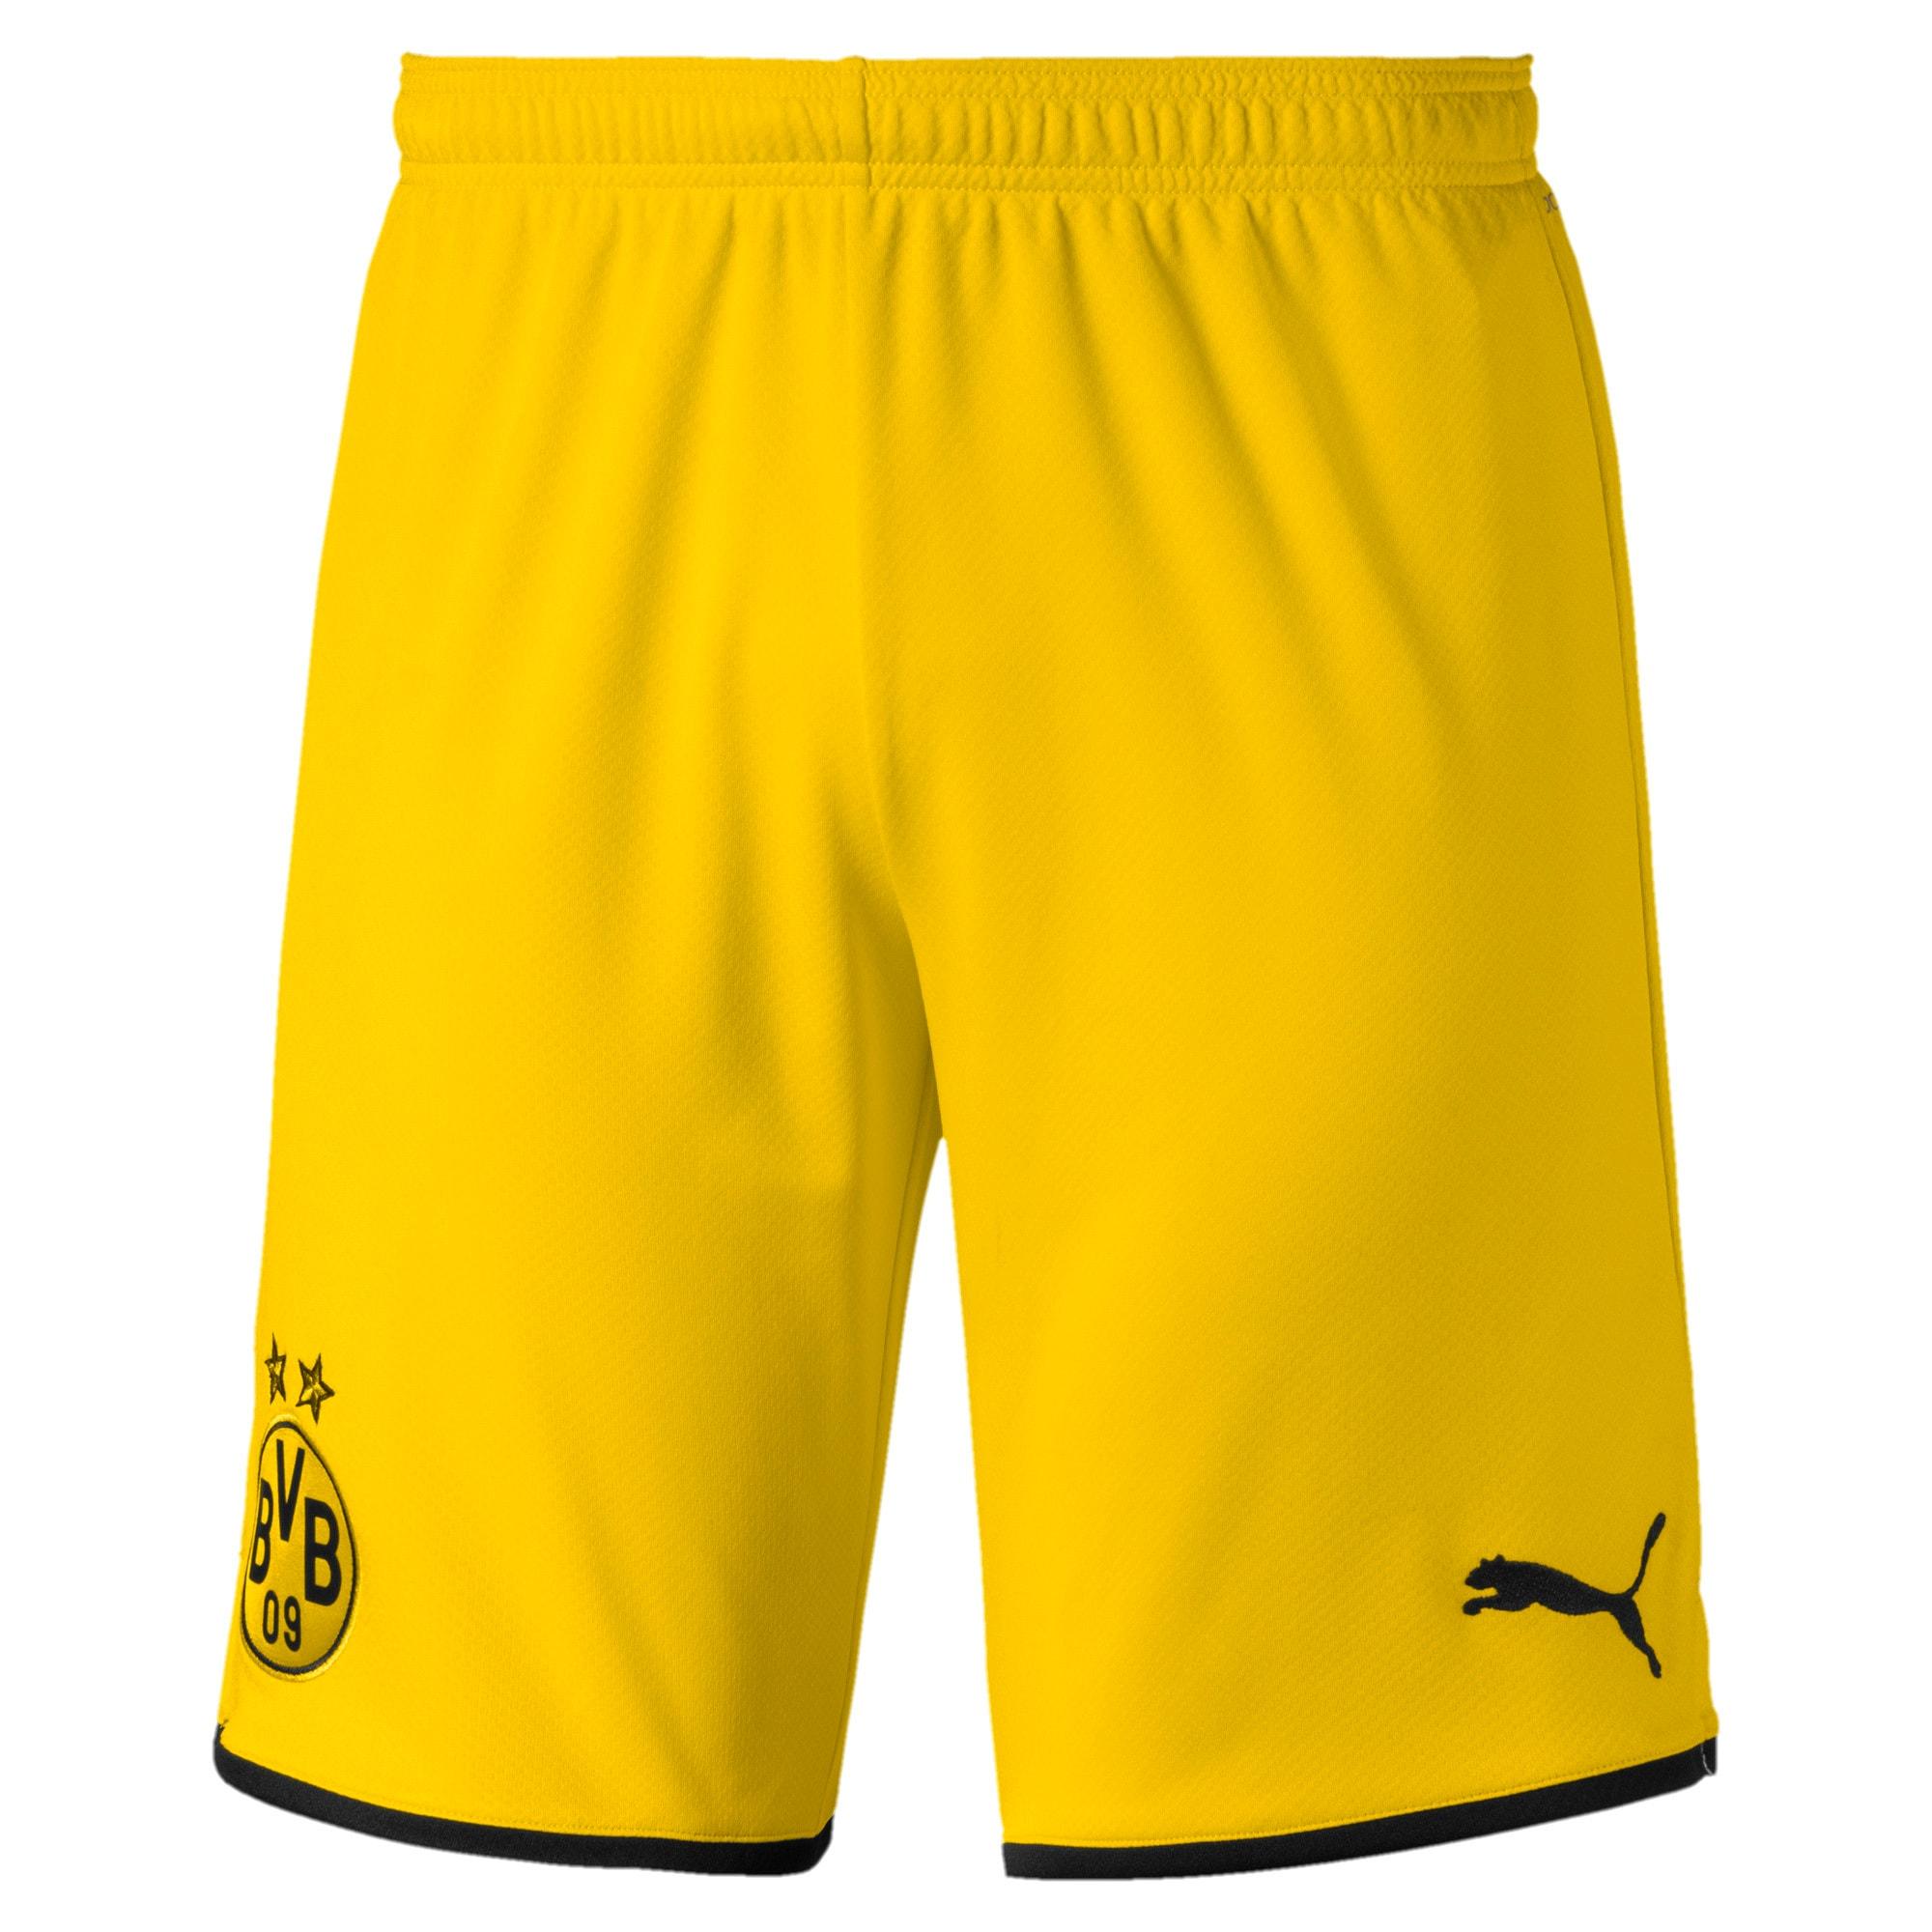 Thumbnail 1 of BVB Men's Away Replica Shorts, Cyber Yellow-Puma Black, medium